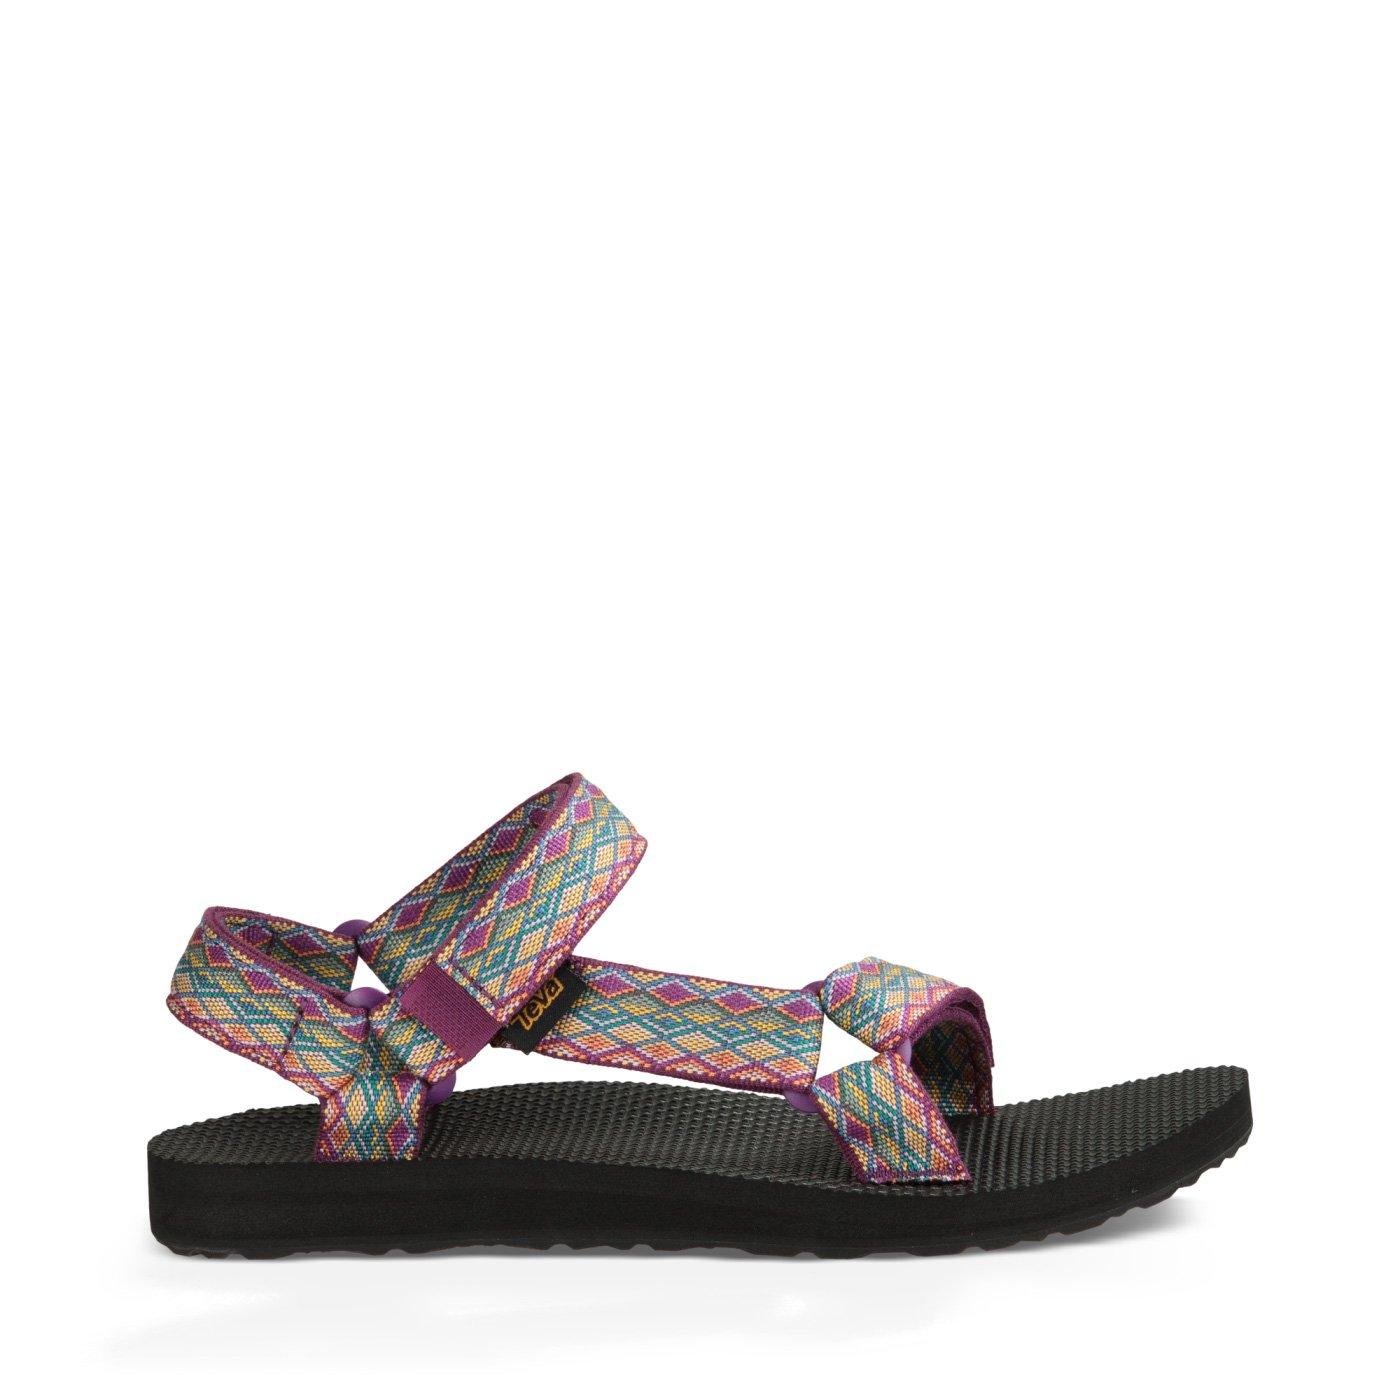 Teva Women's W Original Universal Sandal, Miramar Fade Dark Purple/Multi, 8 M US by Teva